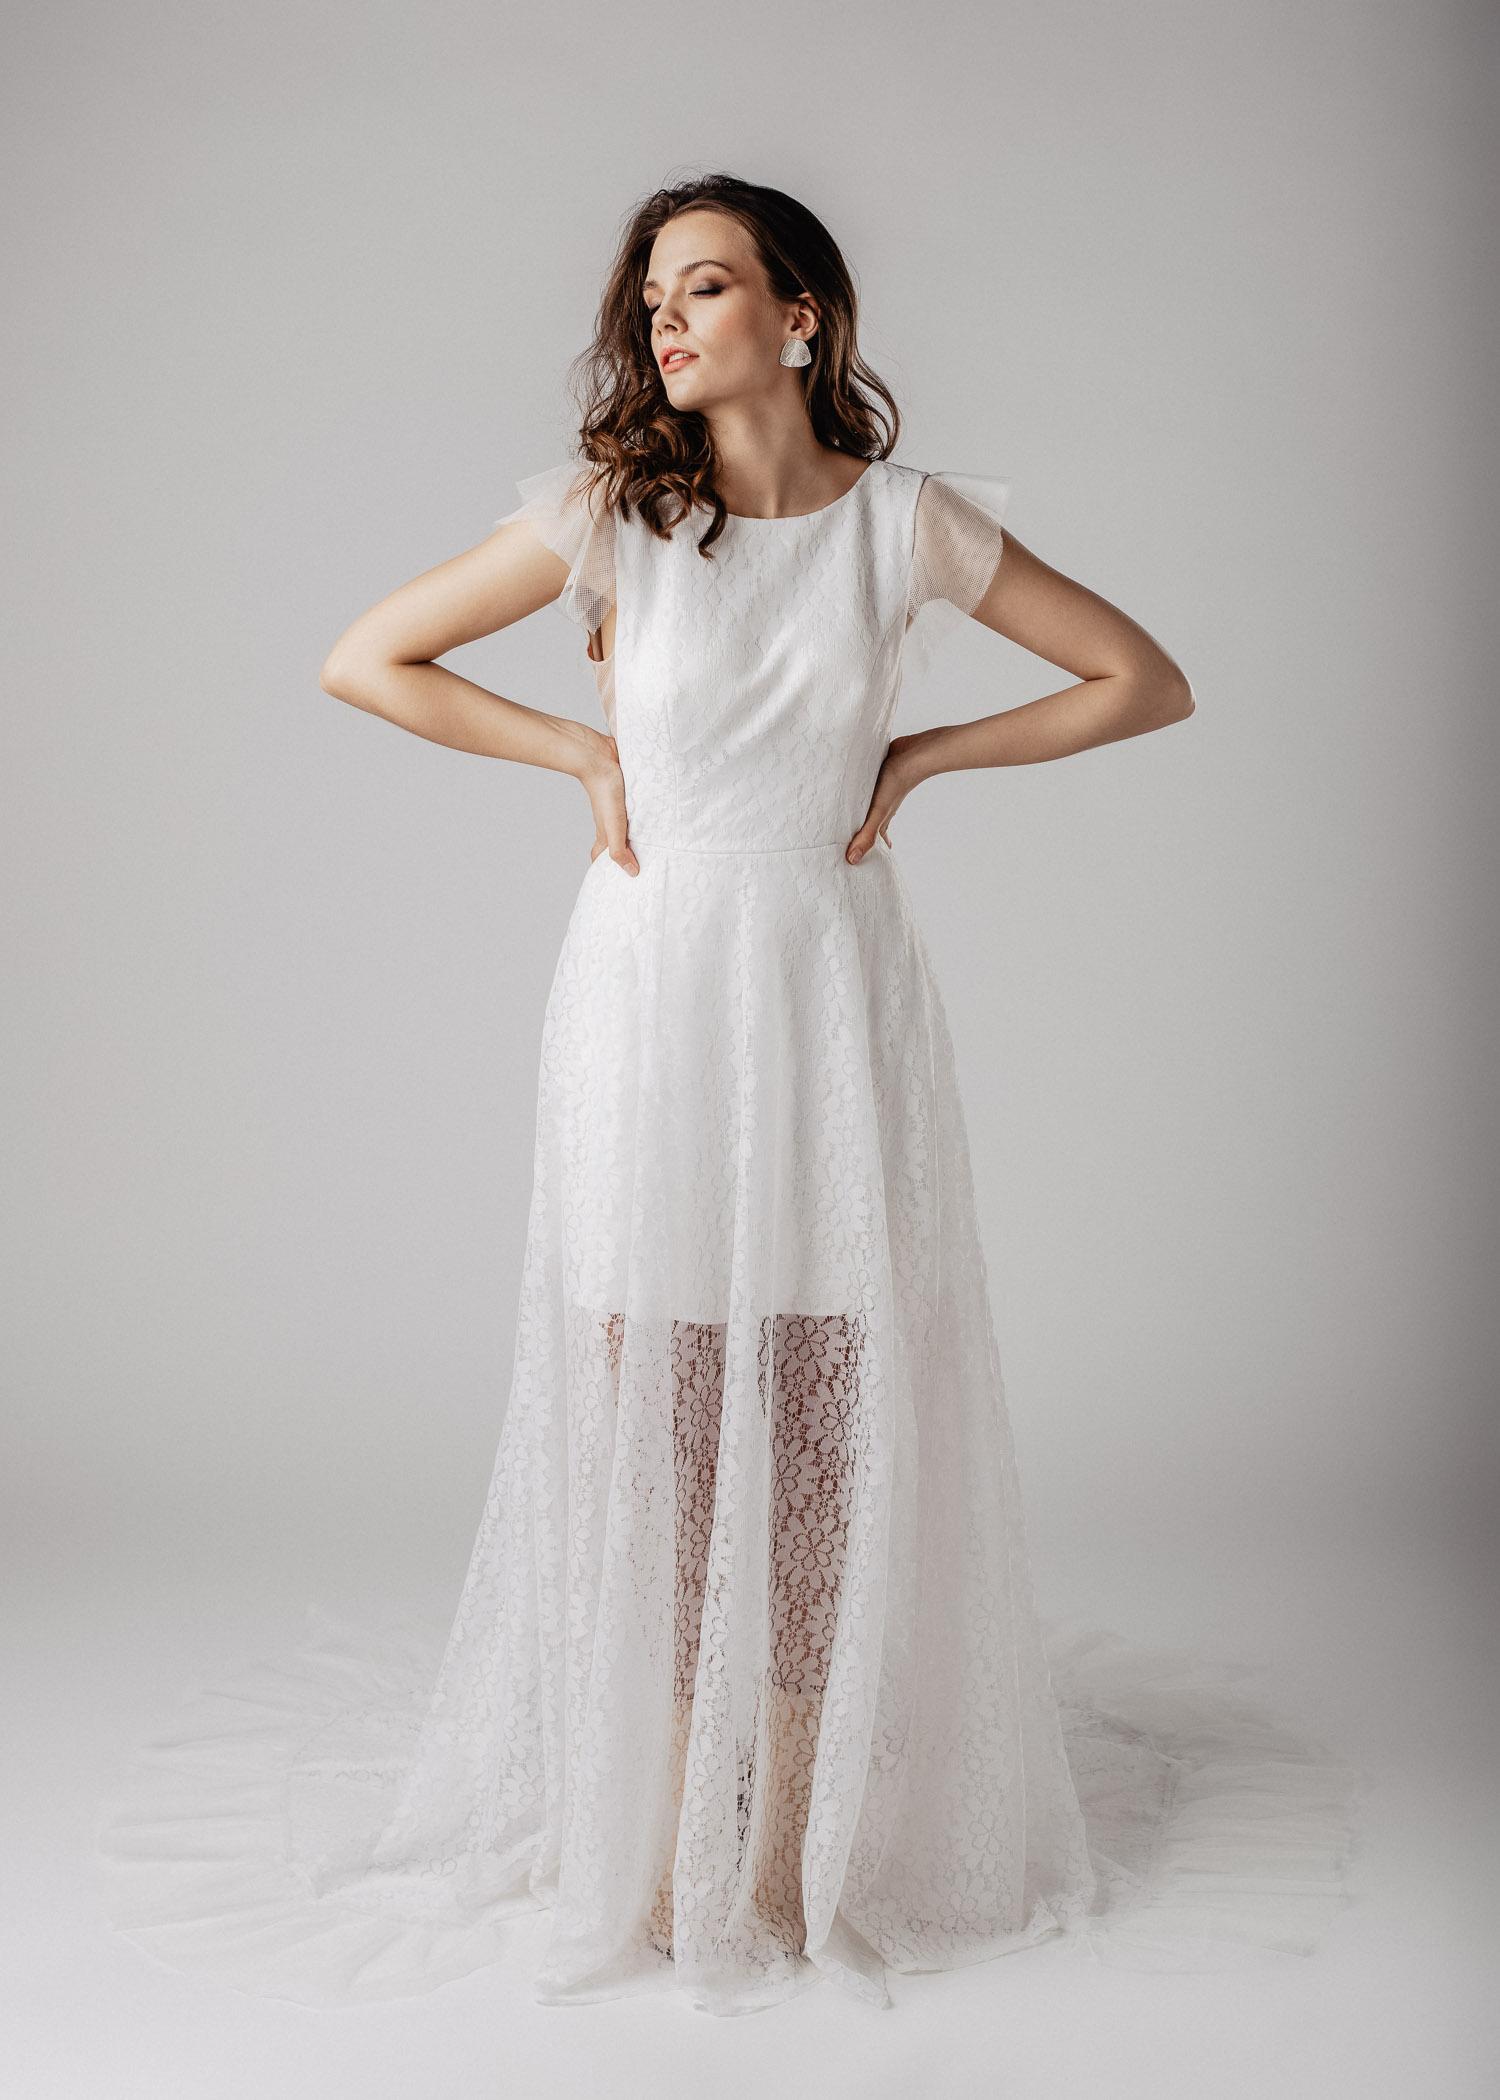 STOCKHOLM wedding gown